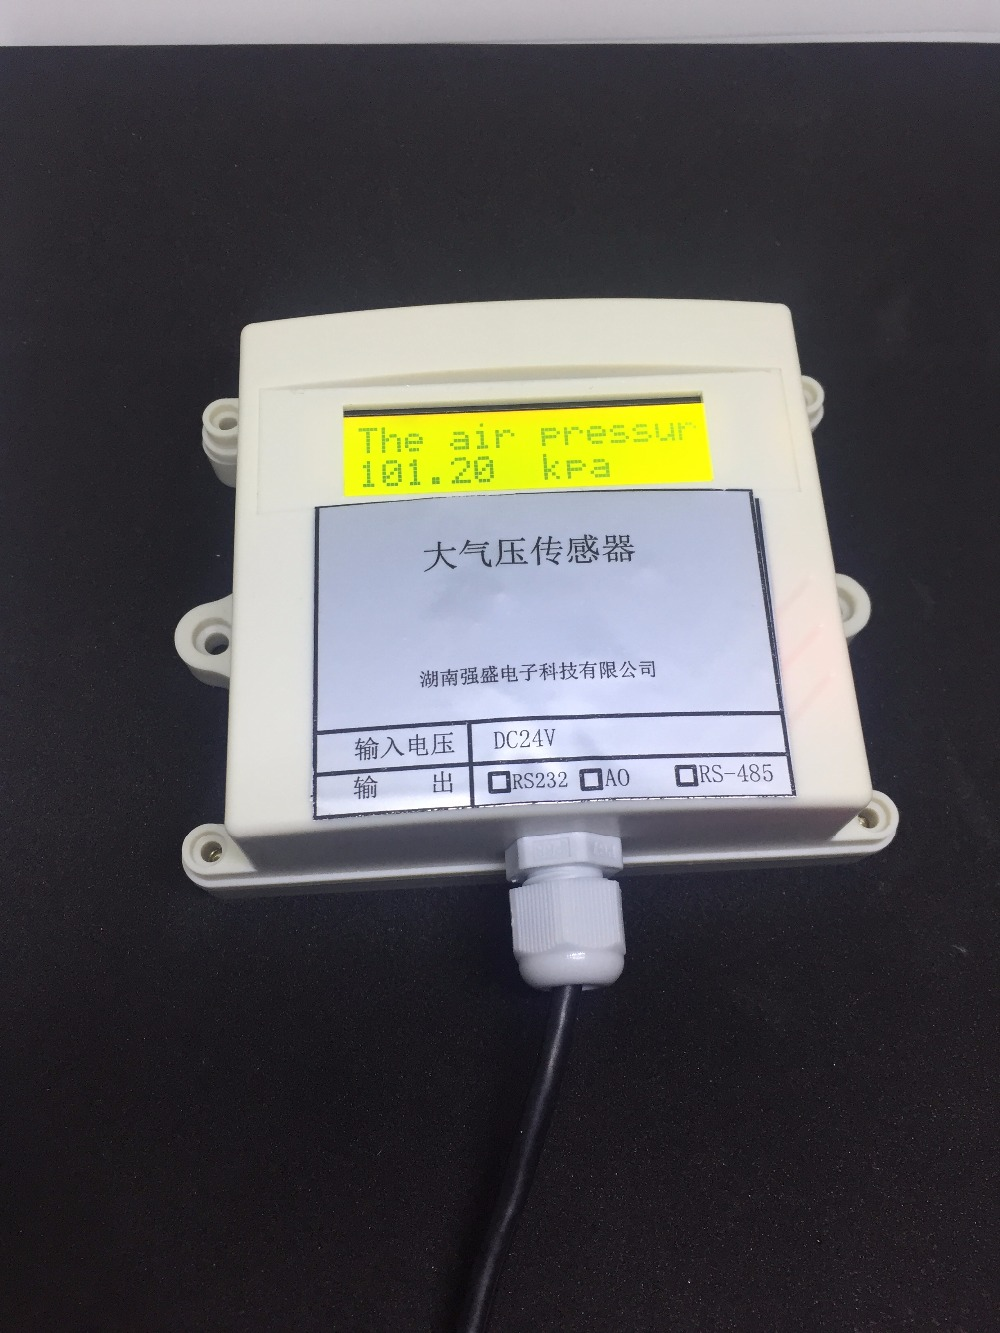 Atmospheric Pressure Transmitter Atmospheric Pressure Sensor MODBUS Air Pressure Sensor 485 Air Pressure Sensor